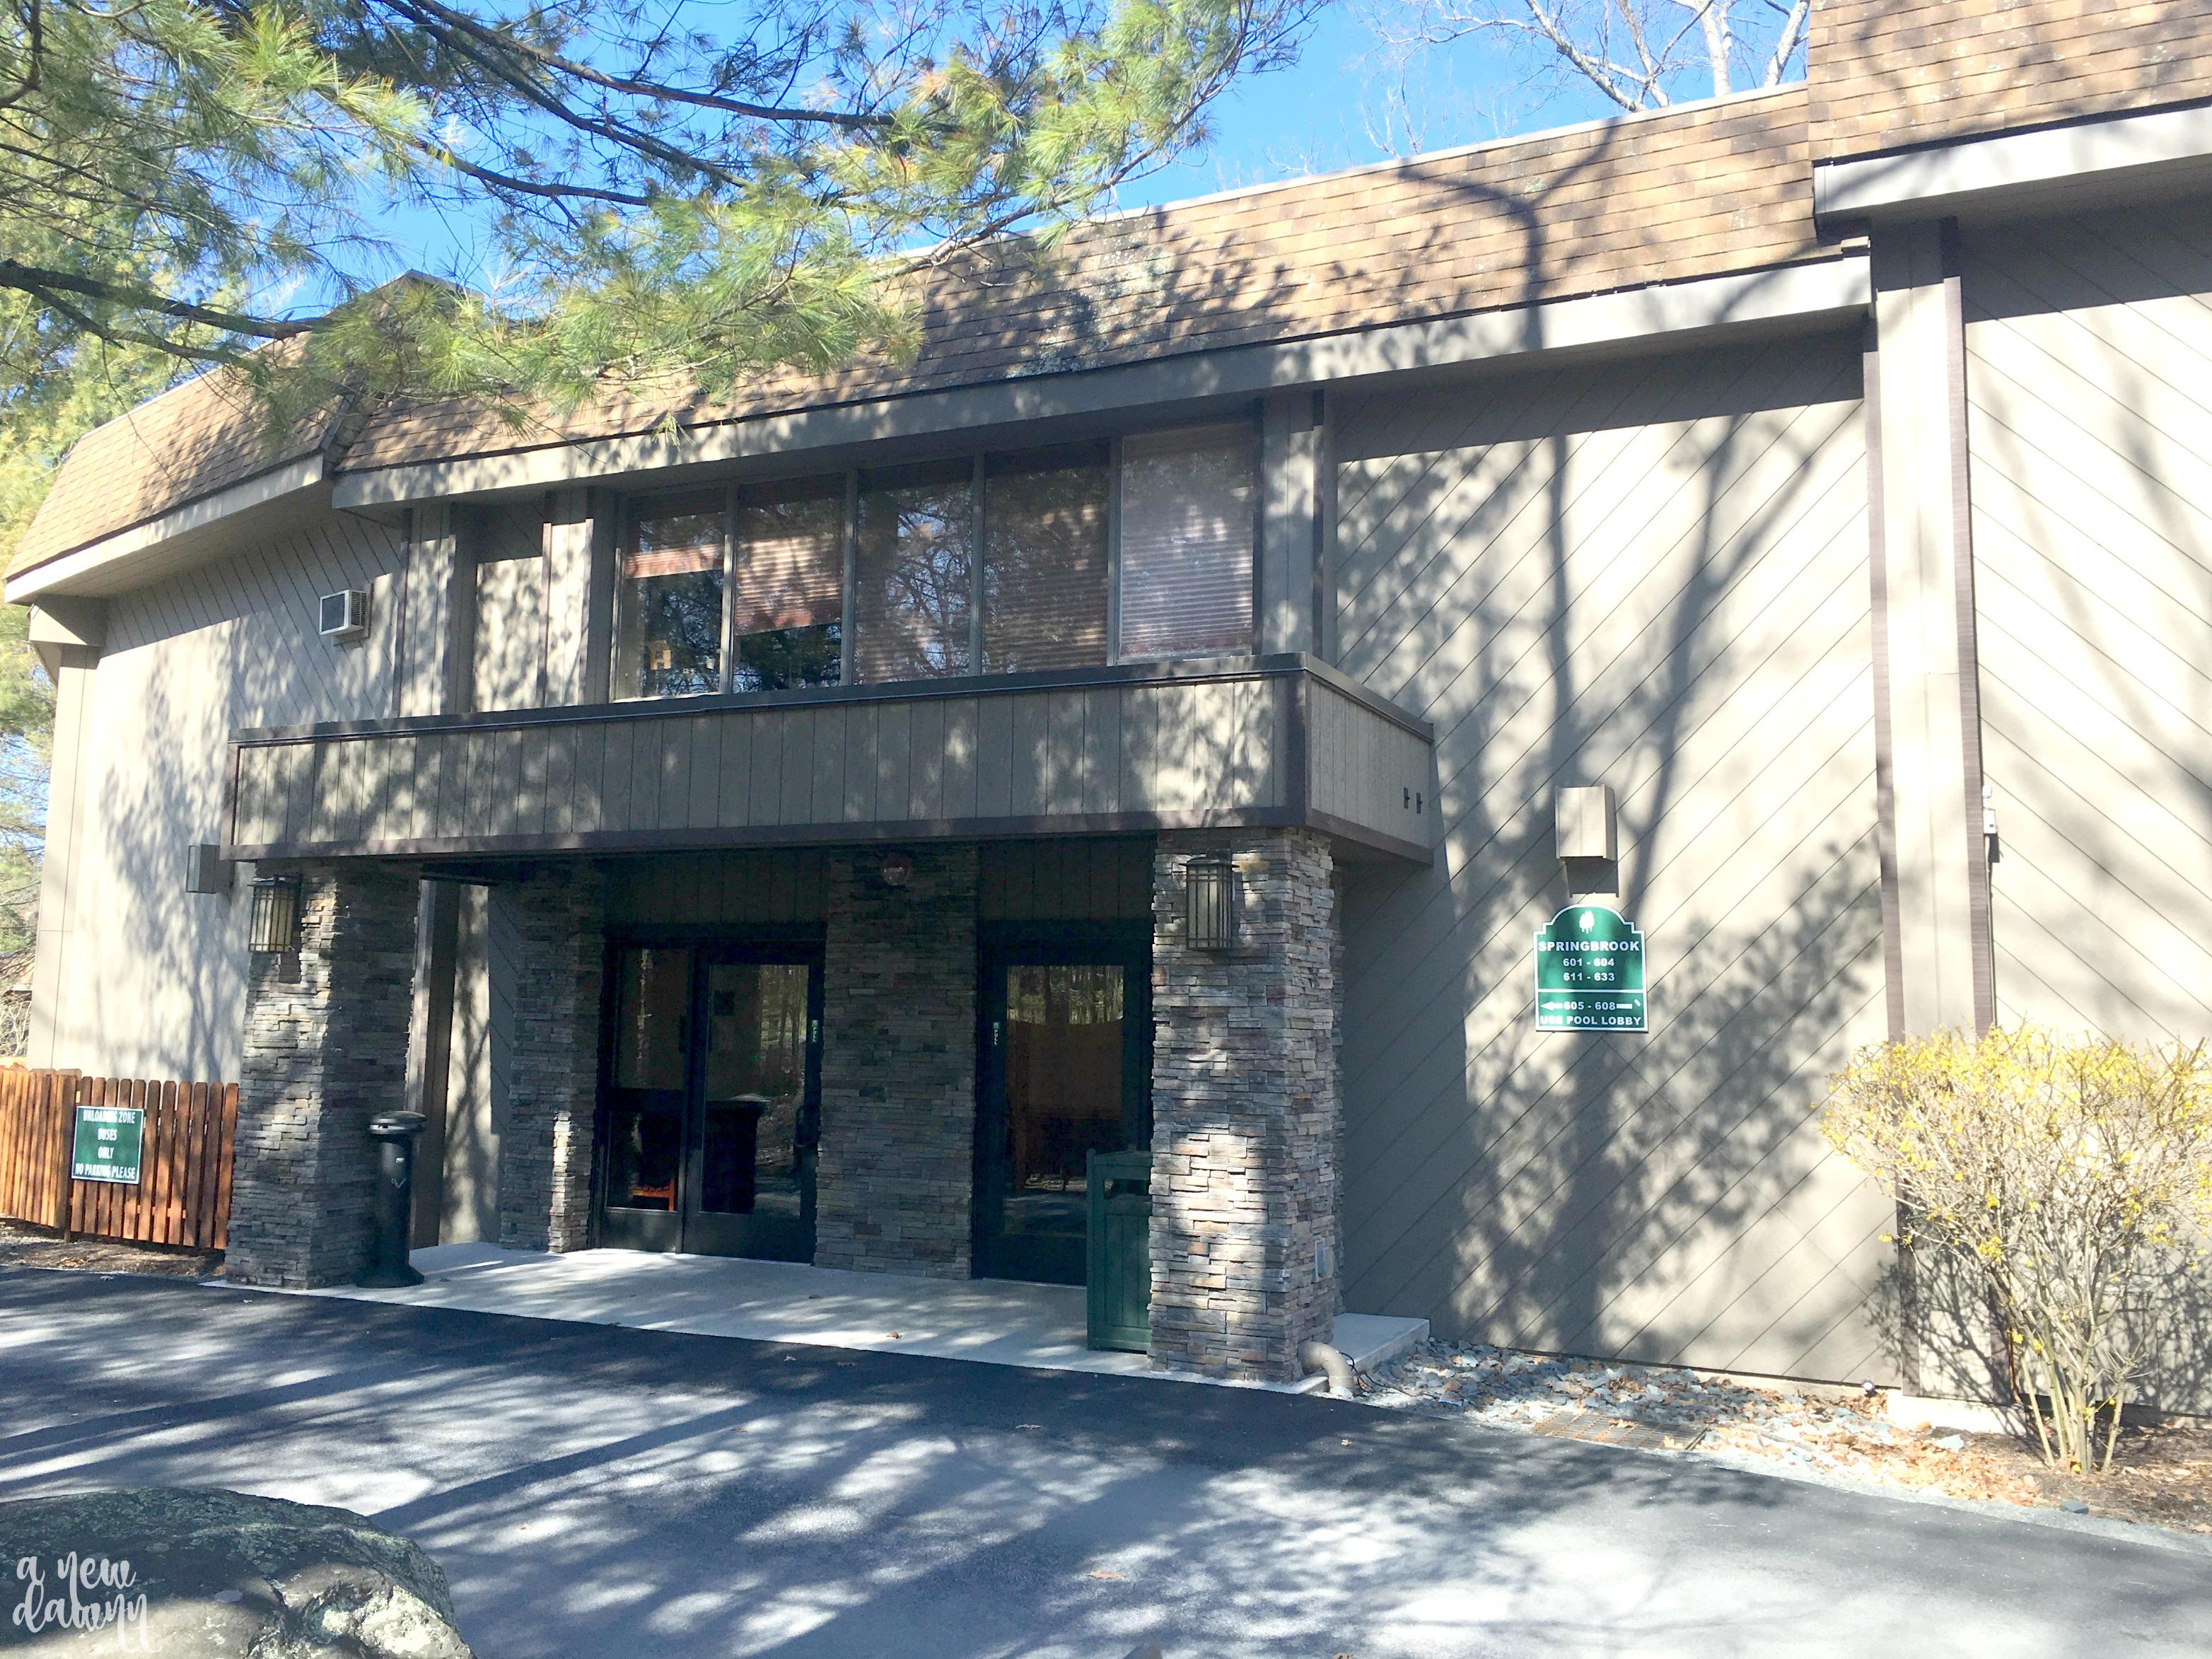 Woodloch-building-entrance